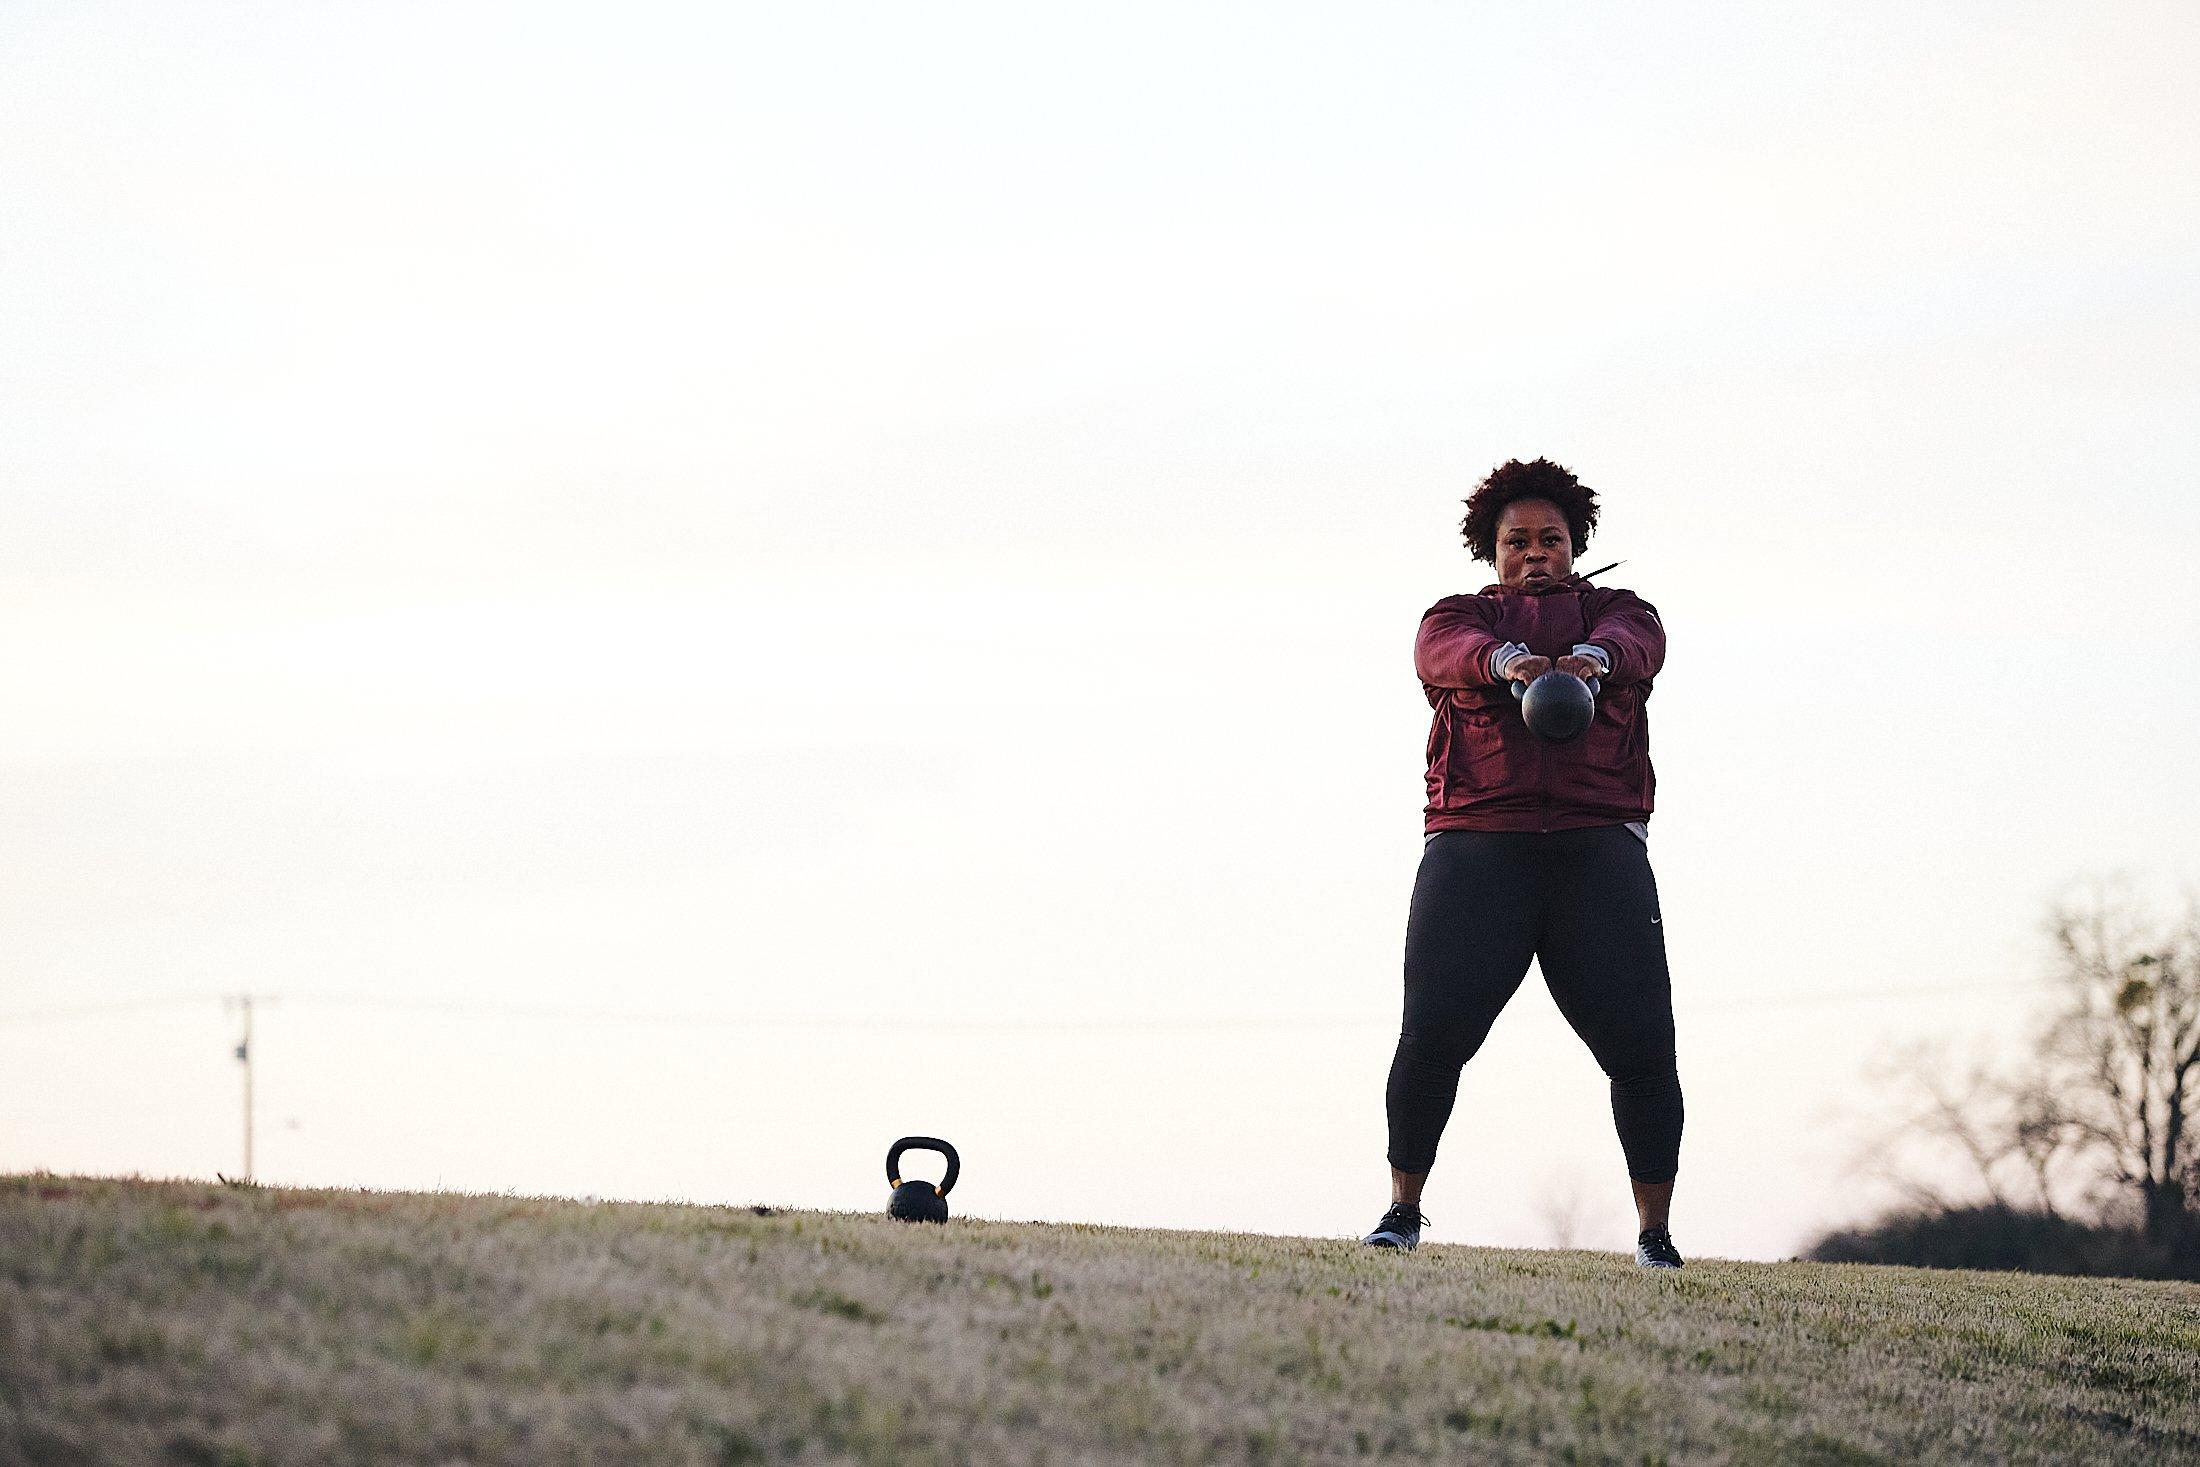 Michelle Carter, wearing a purple longsleeve shirt and black leggings, swings a kettlebell.